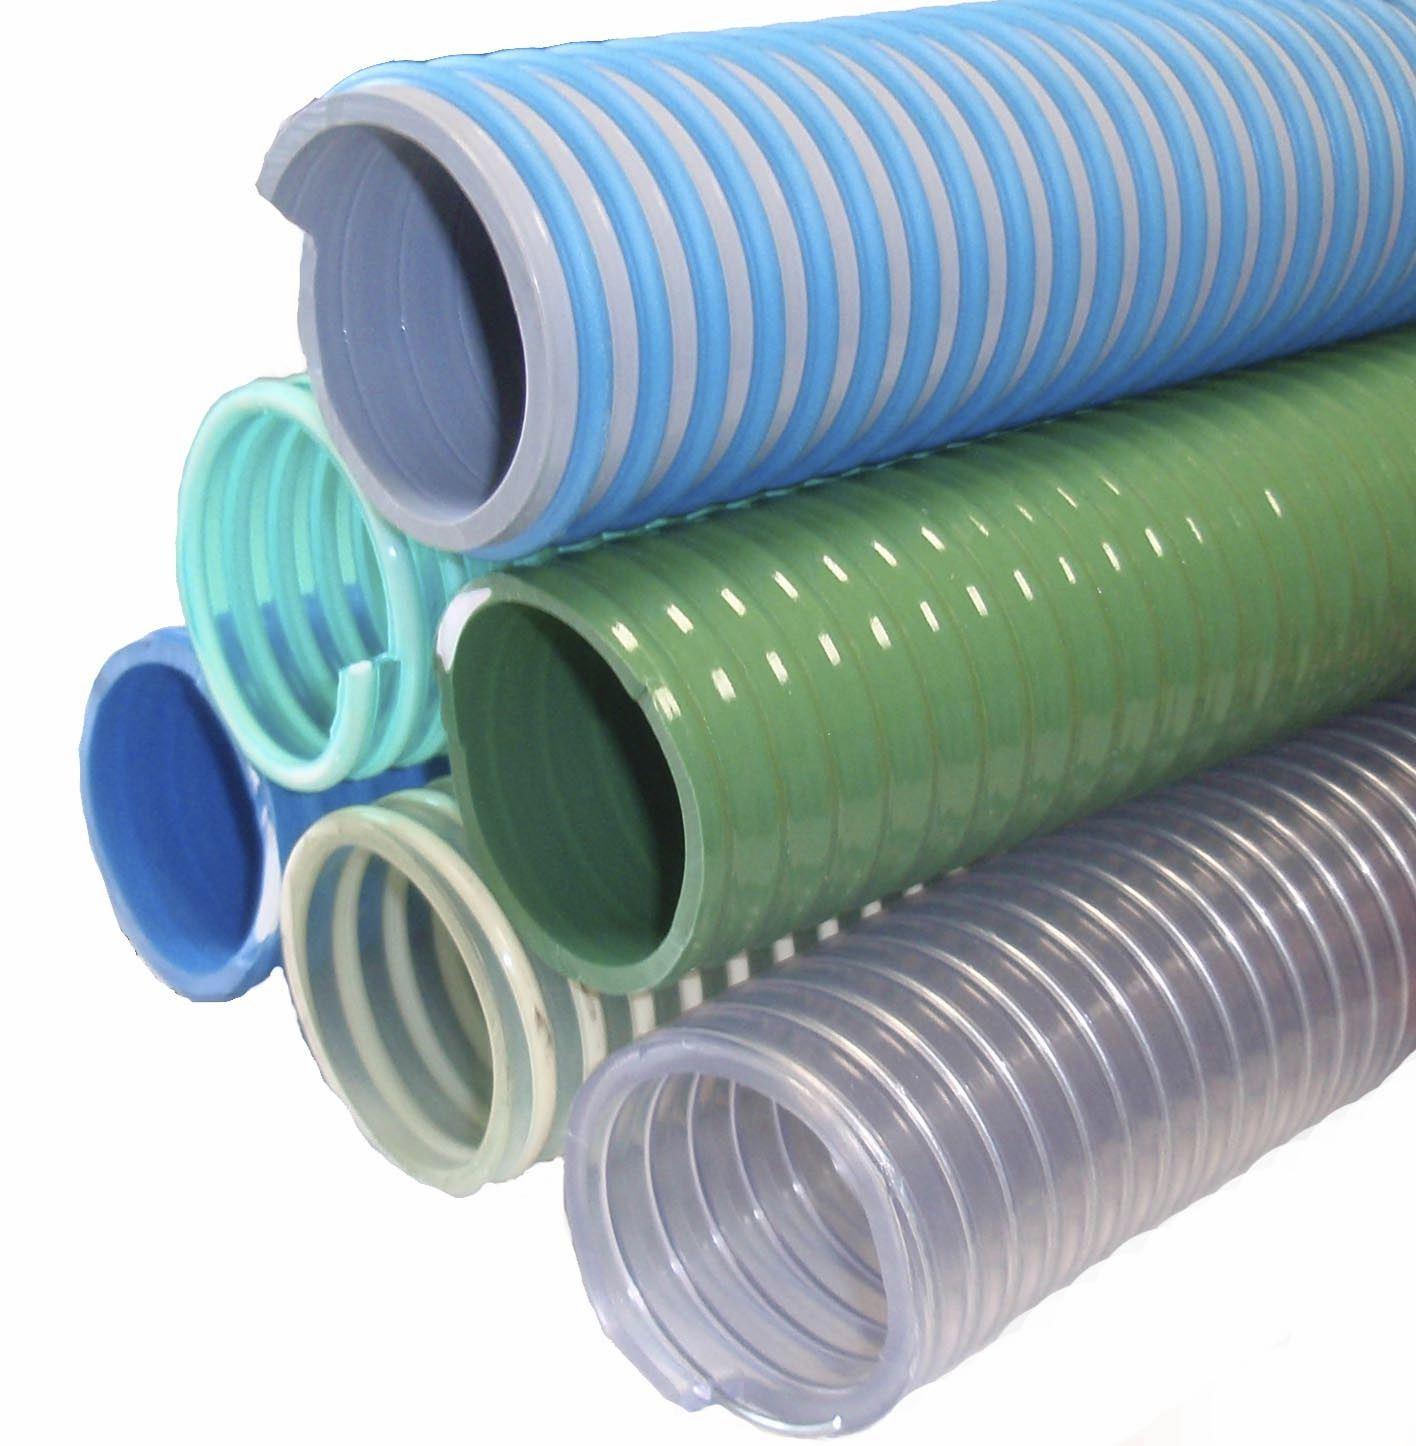 PVC-Suction-Pipe-Plastic-Hose.jpg